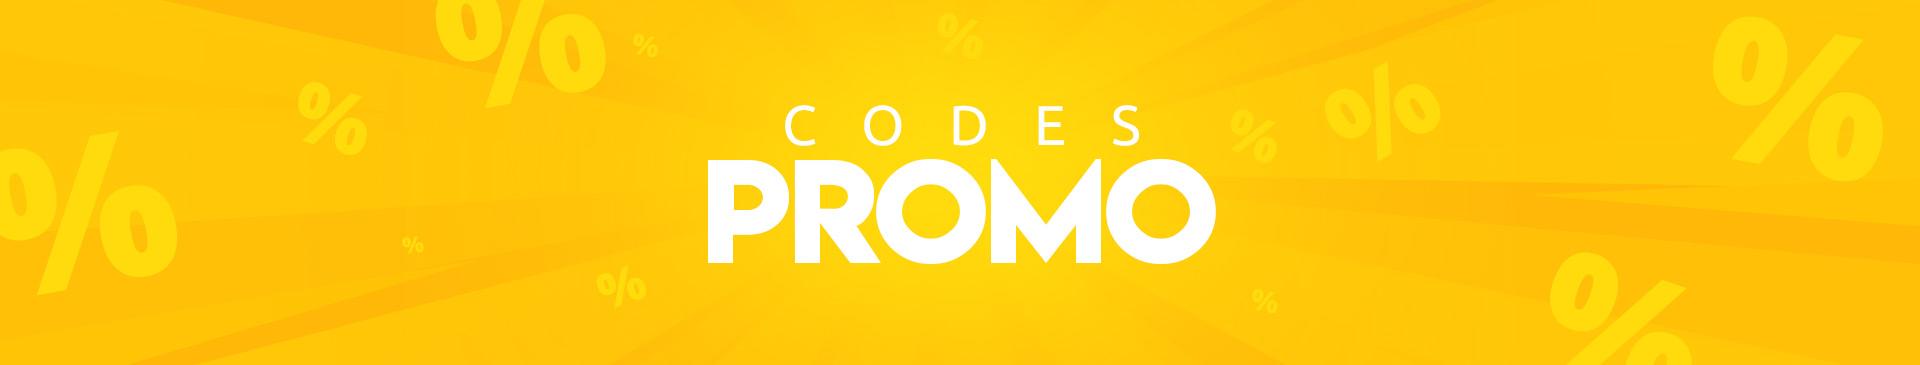 Manelli codes promo